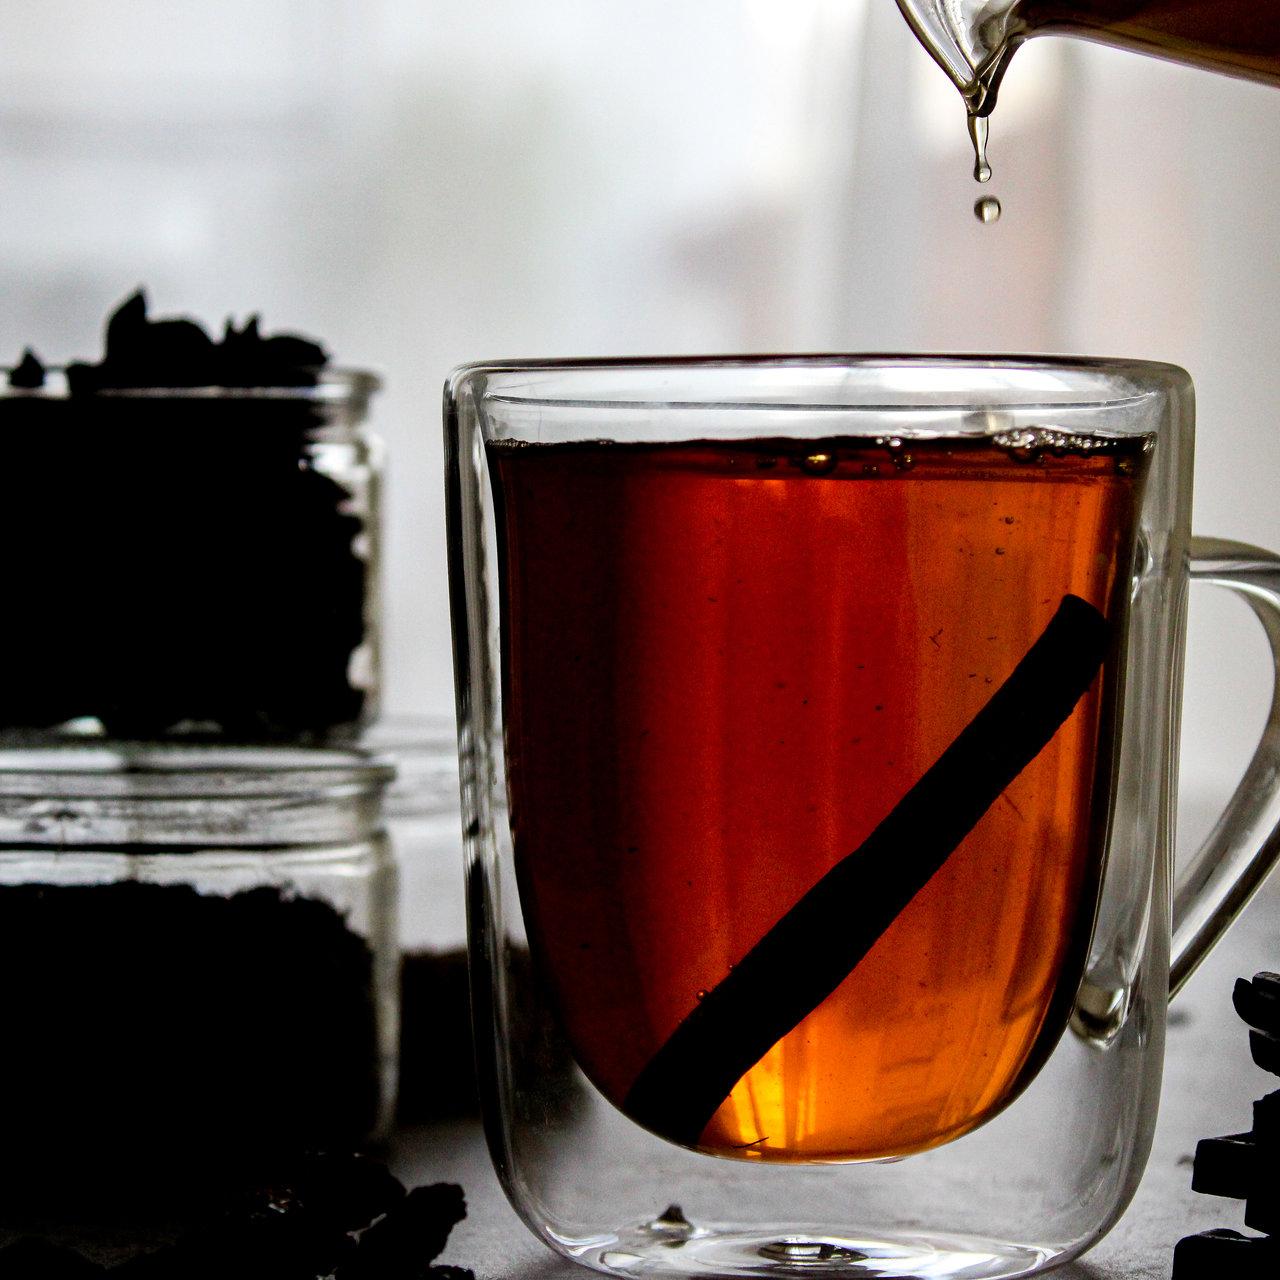 The tea is emotion   Author Christiana Yonkova - christa_foodpoetry   PHOTO FORUM